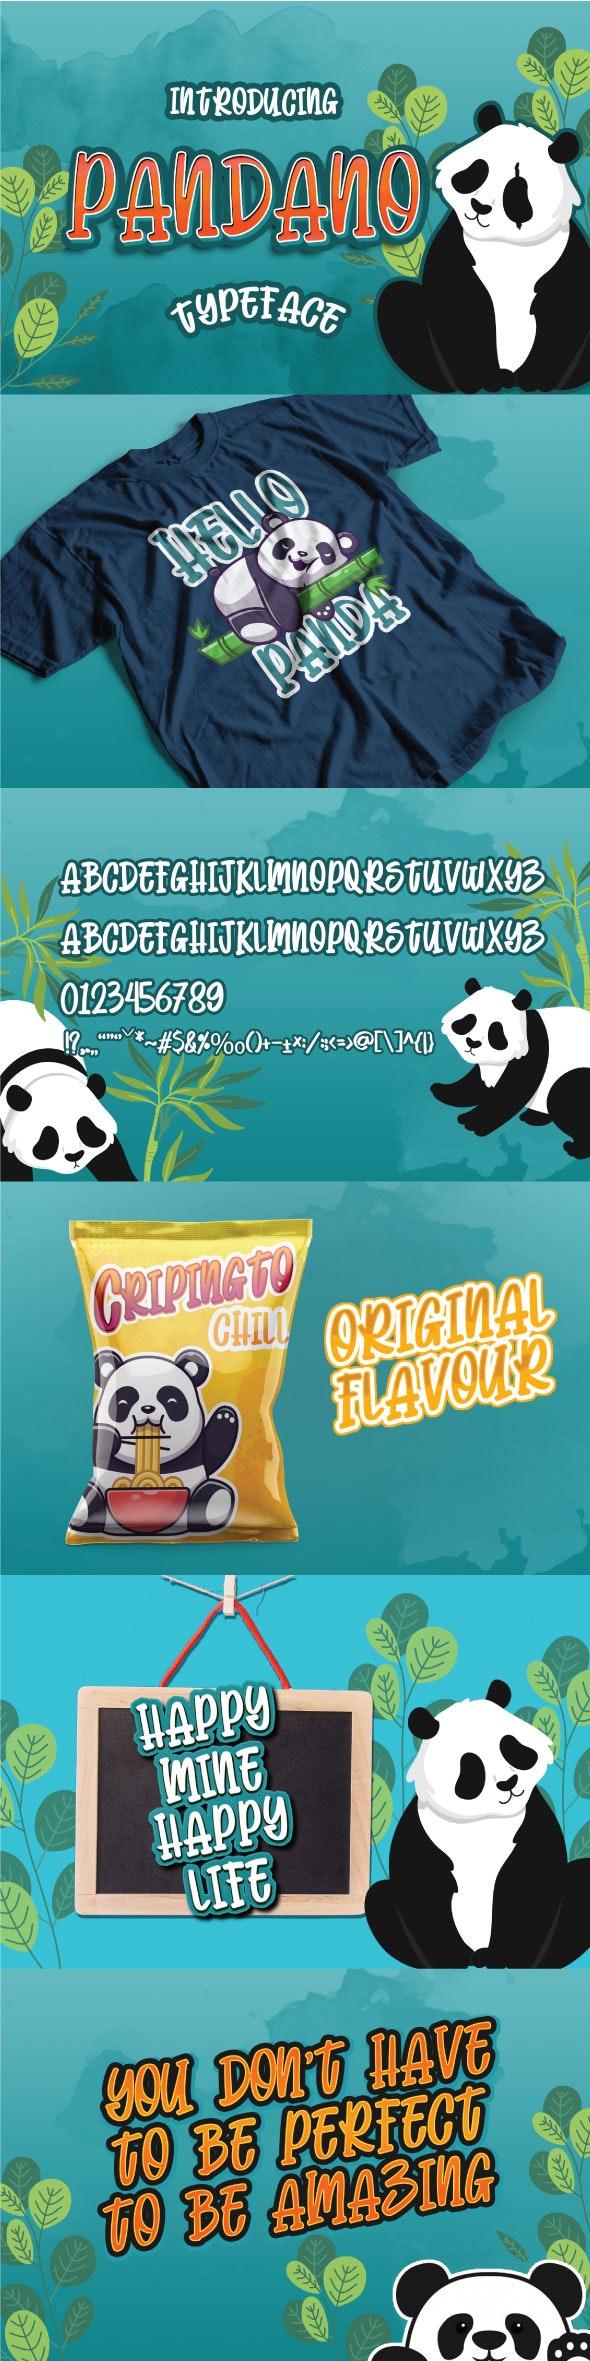 Pandano - Comic Decorative